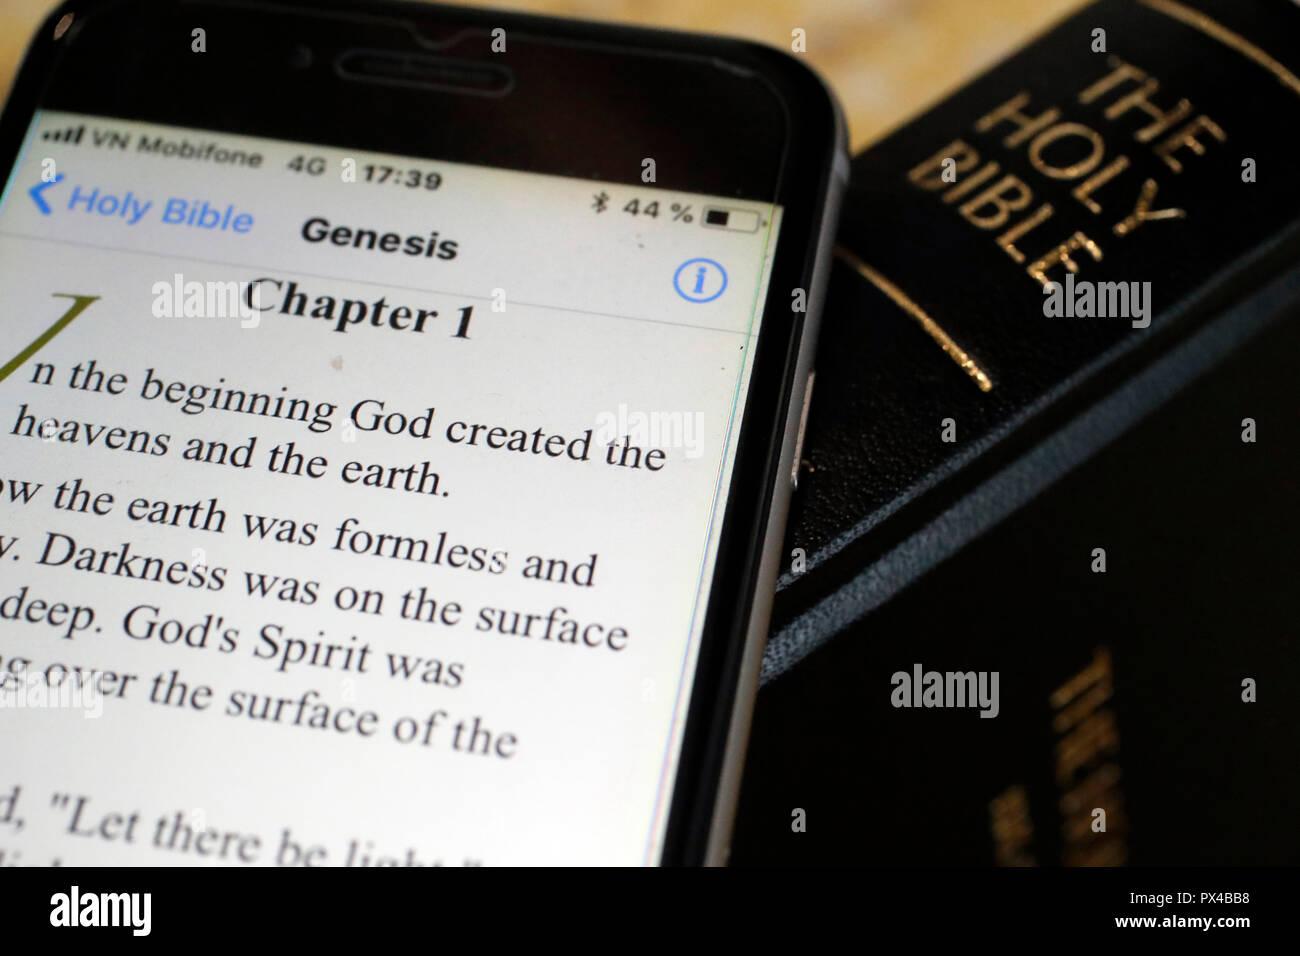 Papier und digitale Bibel Bibel App auf dem Smartphone. Das Alte Testament. Genesis. Stockbild